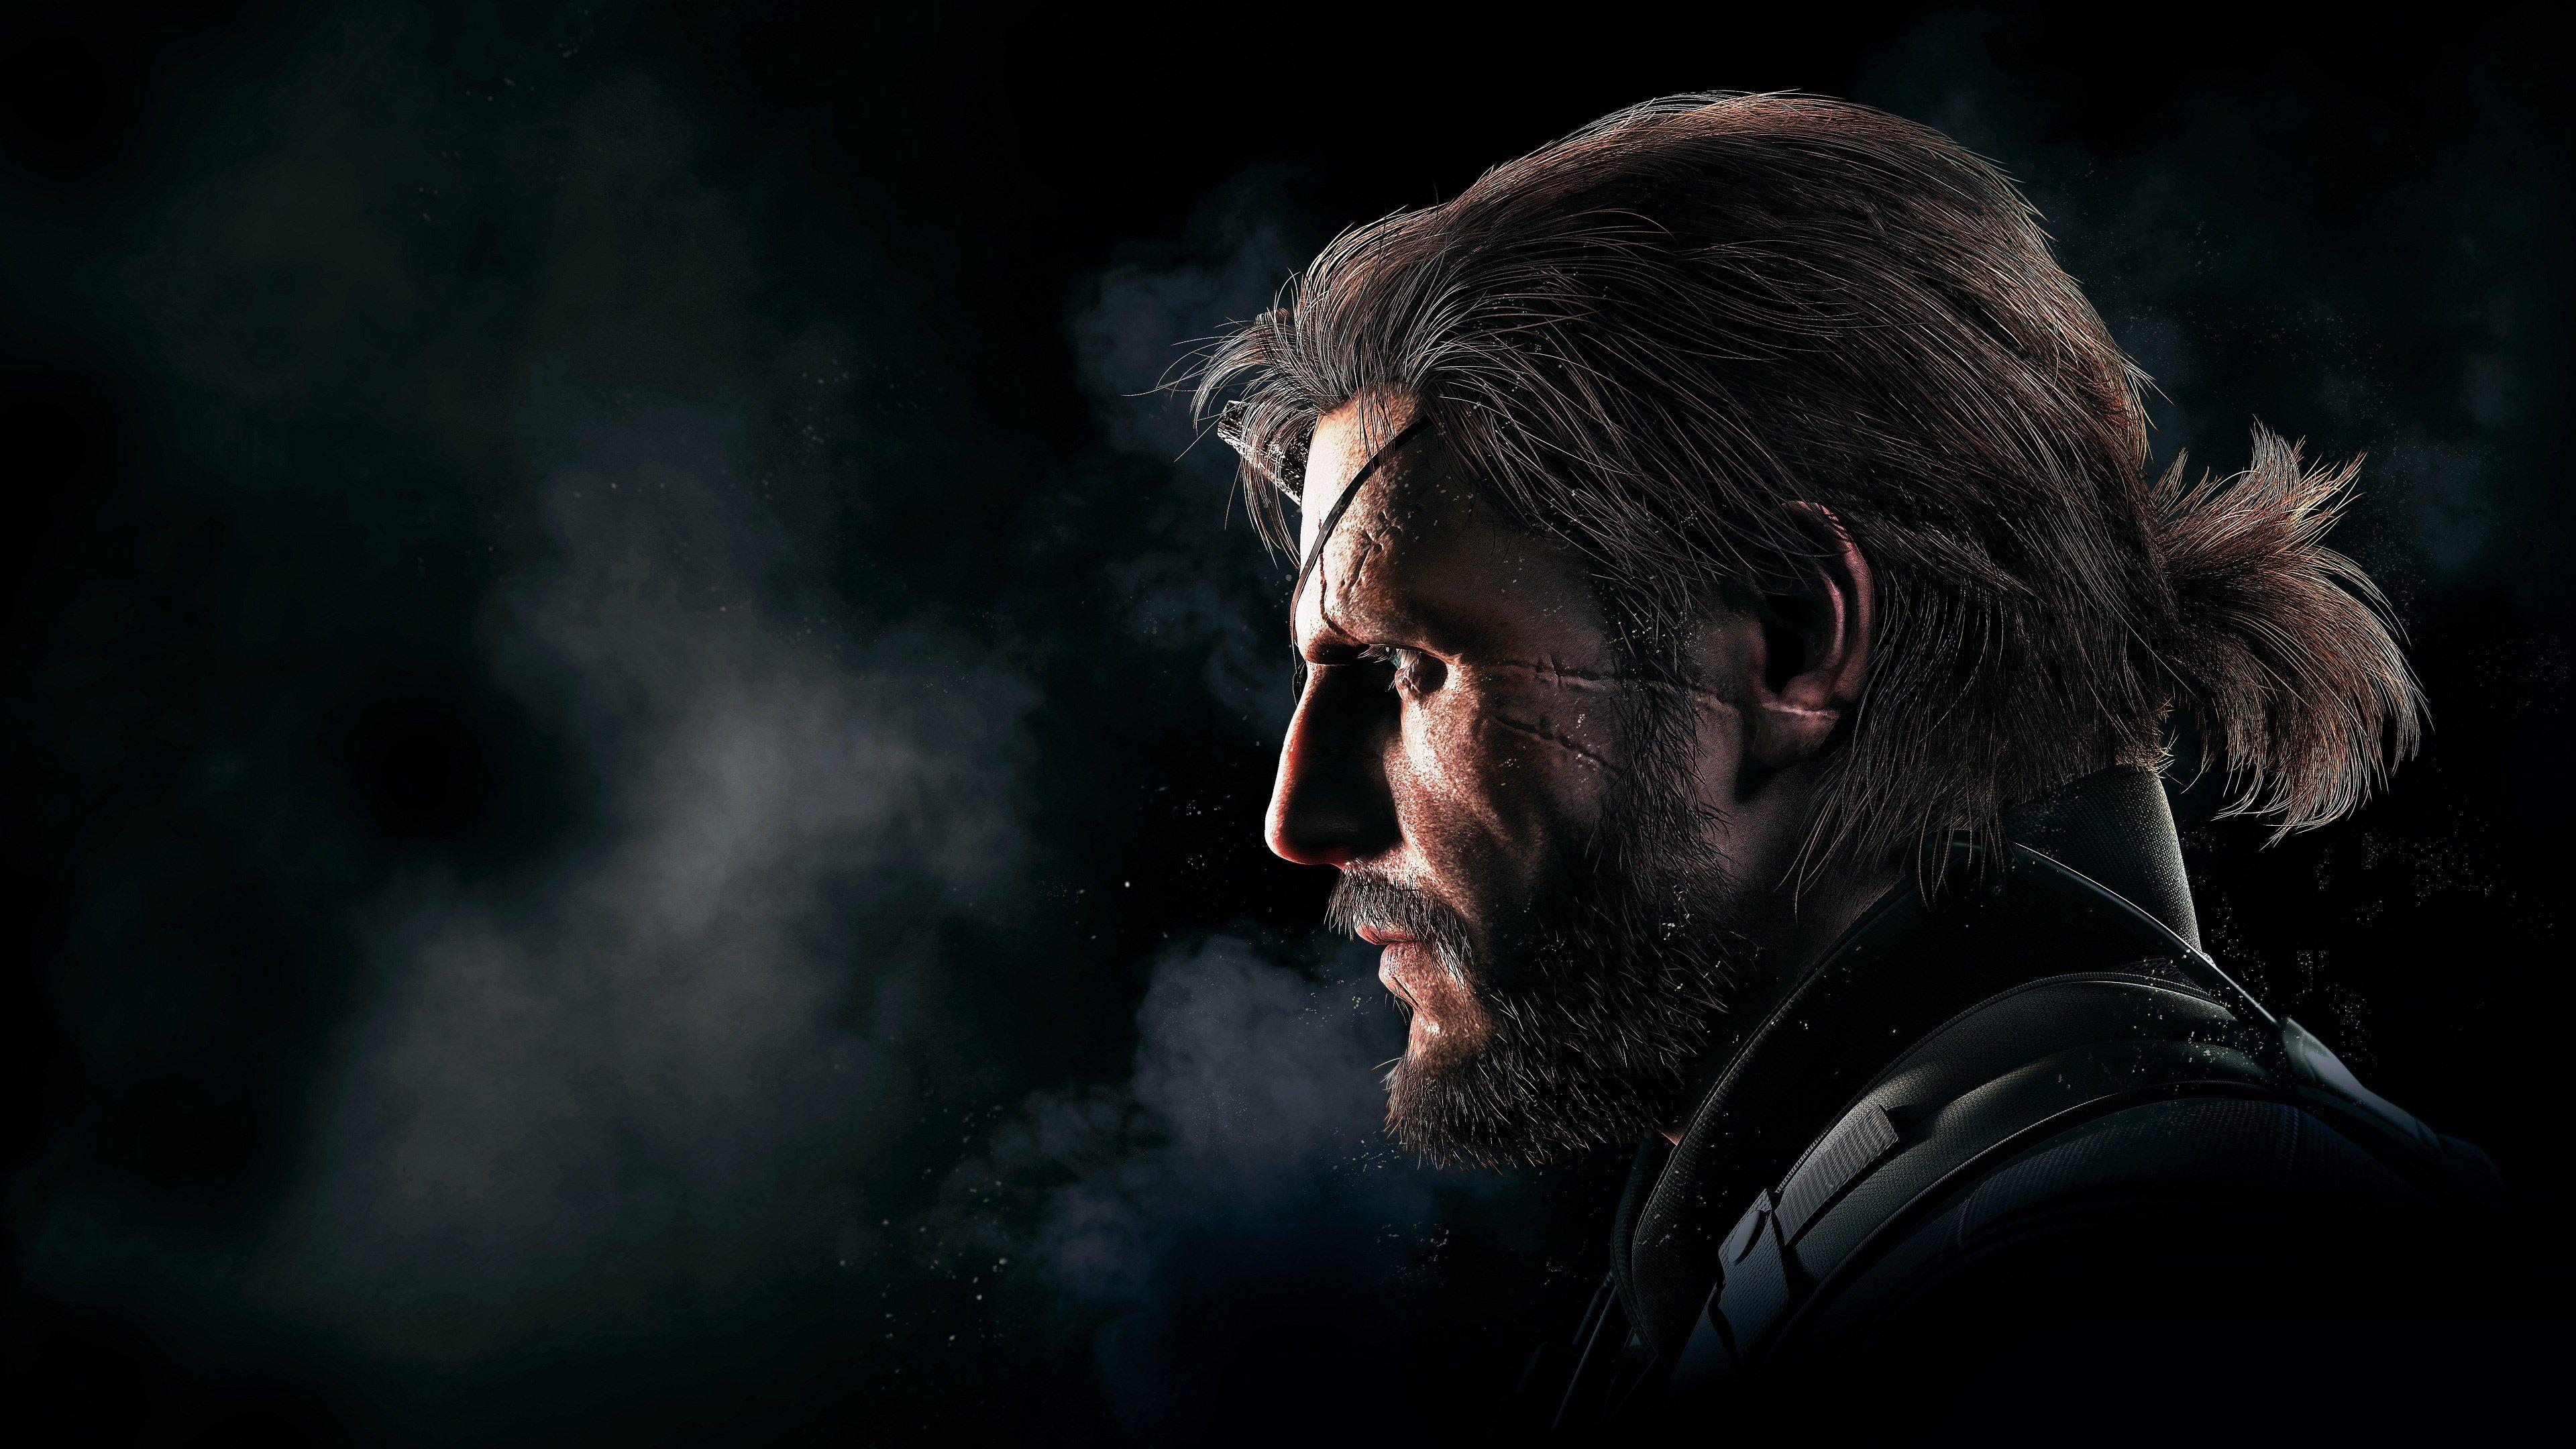 3840x2160 Metal Gear Solid V 4k Computer Backgrounds Wallpaper